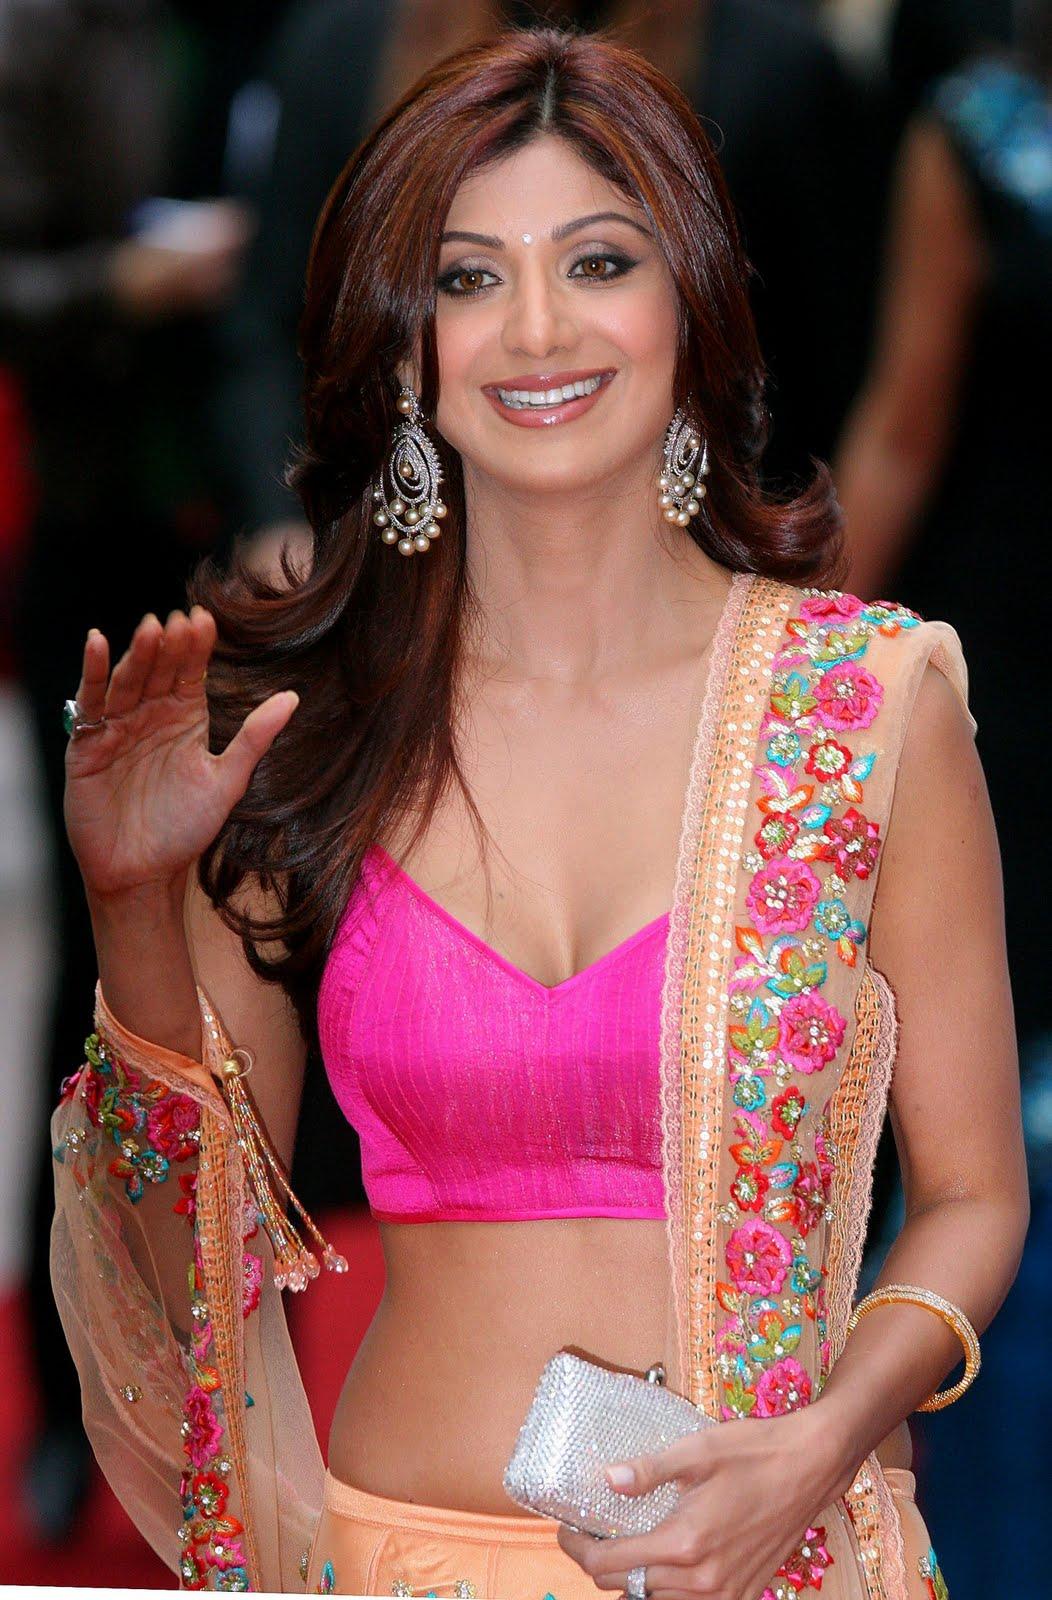 Shilpa Shetty sexy foto